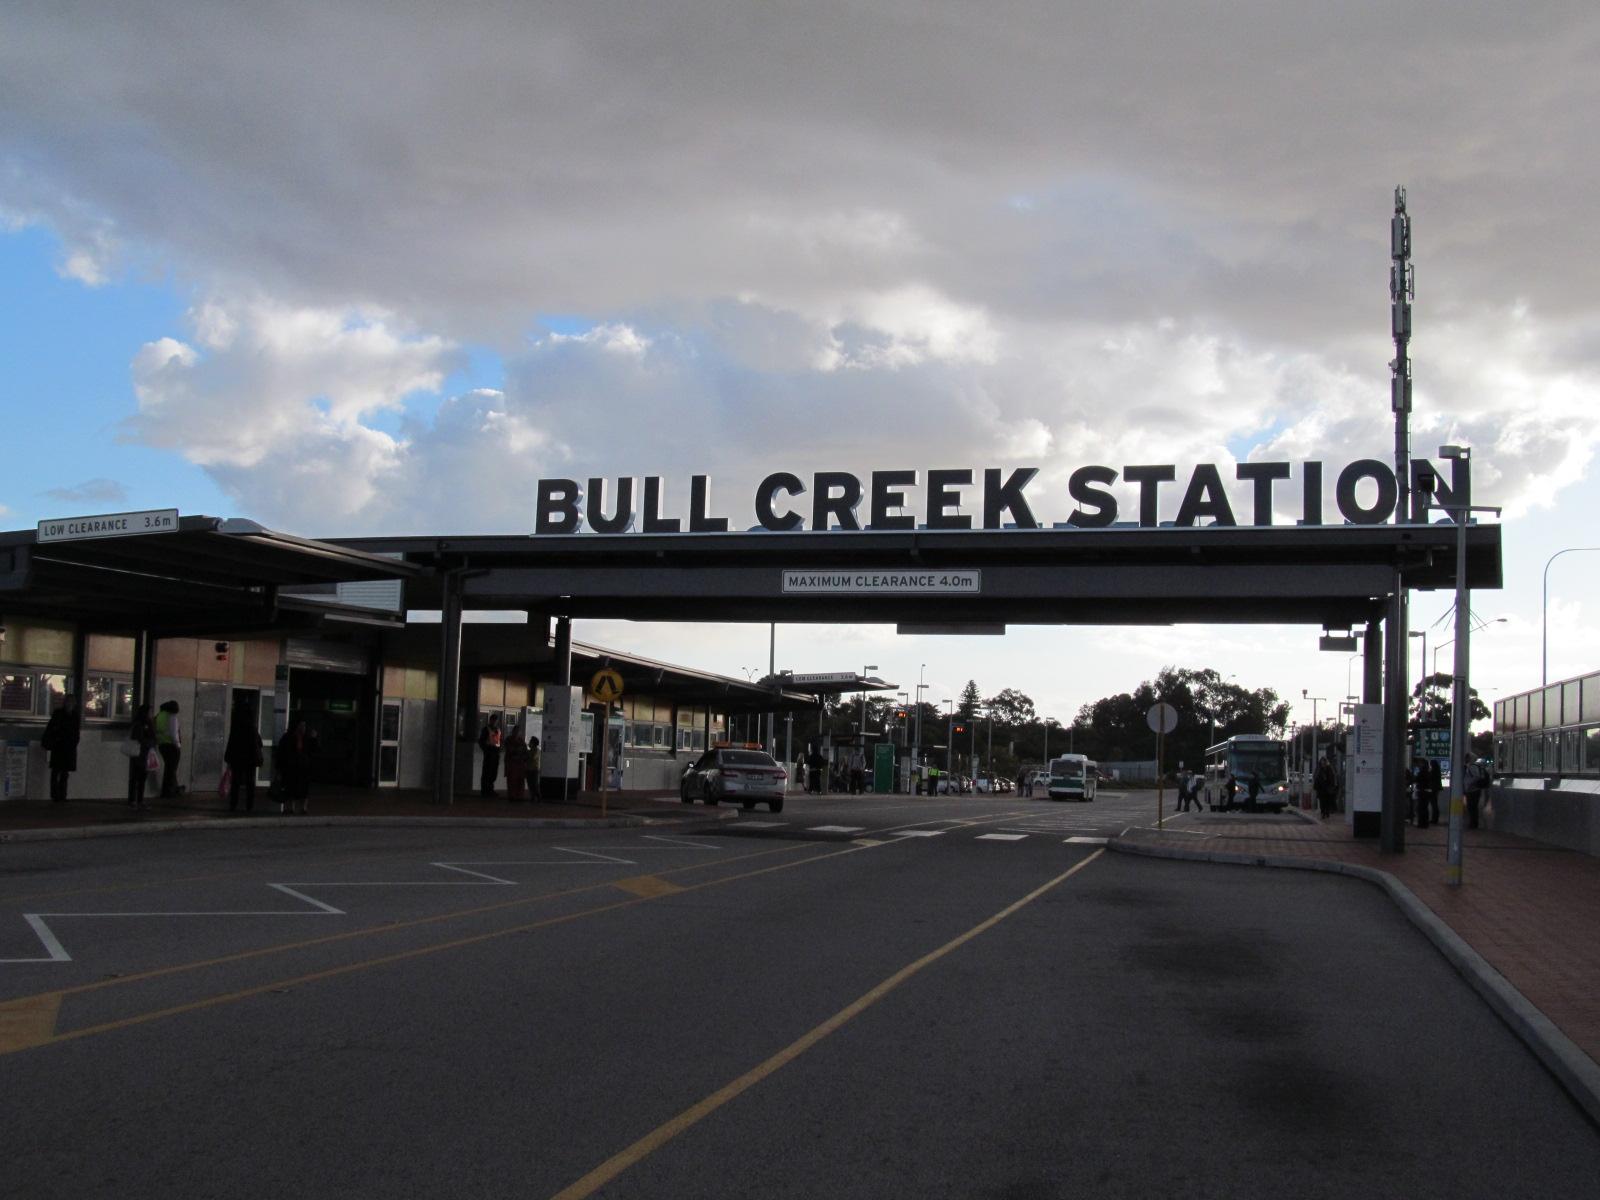 Bull Creek Australia  city photos : Bull Creek station bus level W Wikimedia Commons